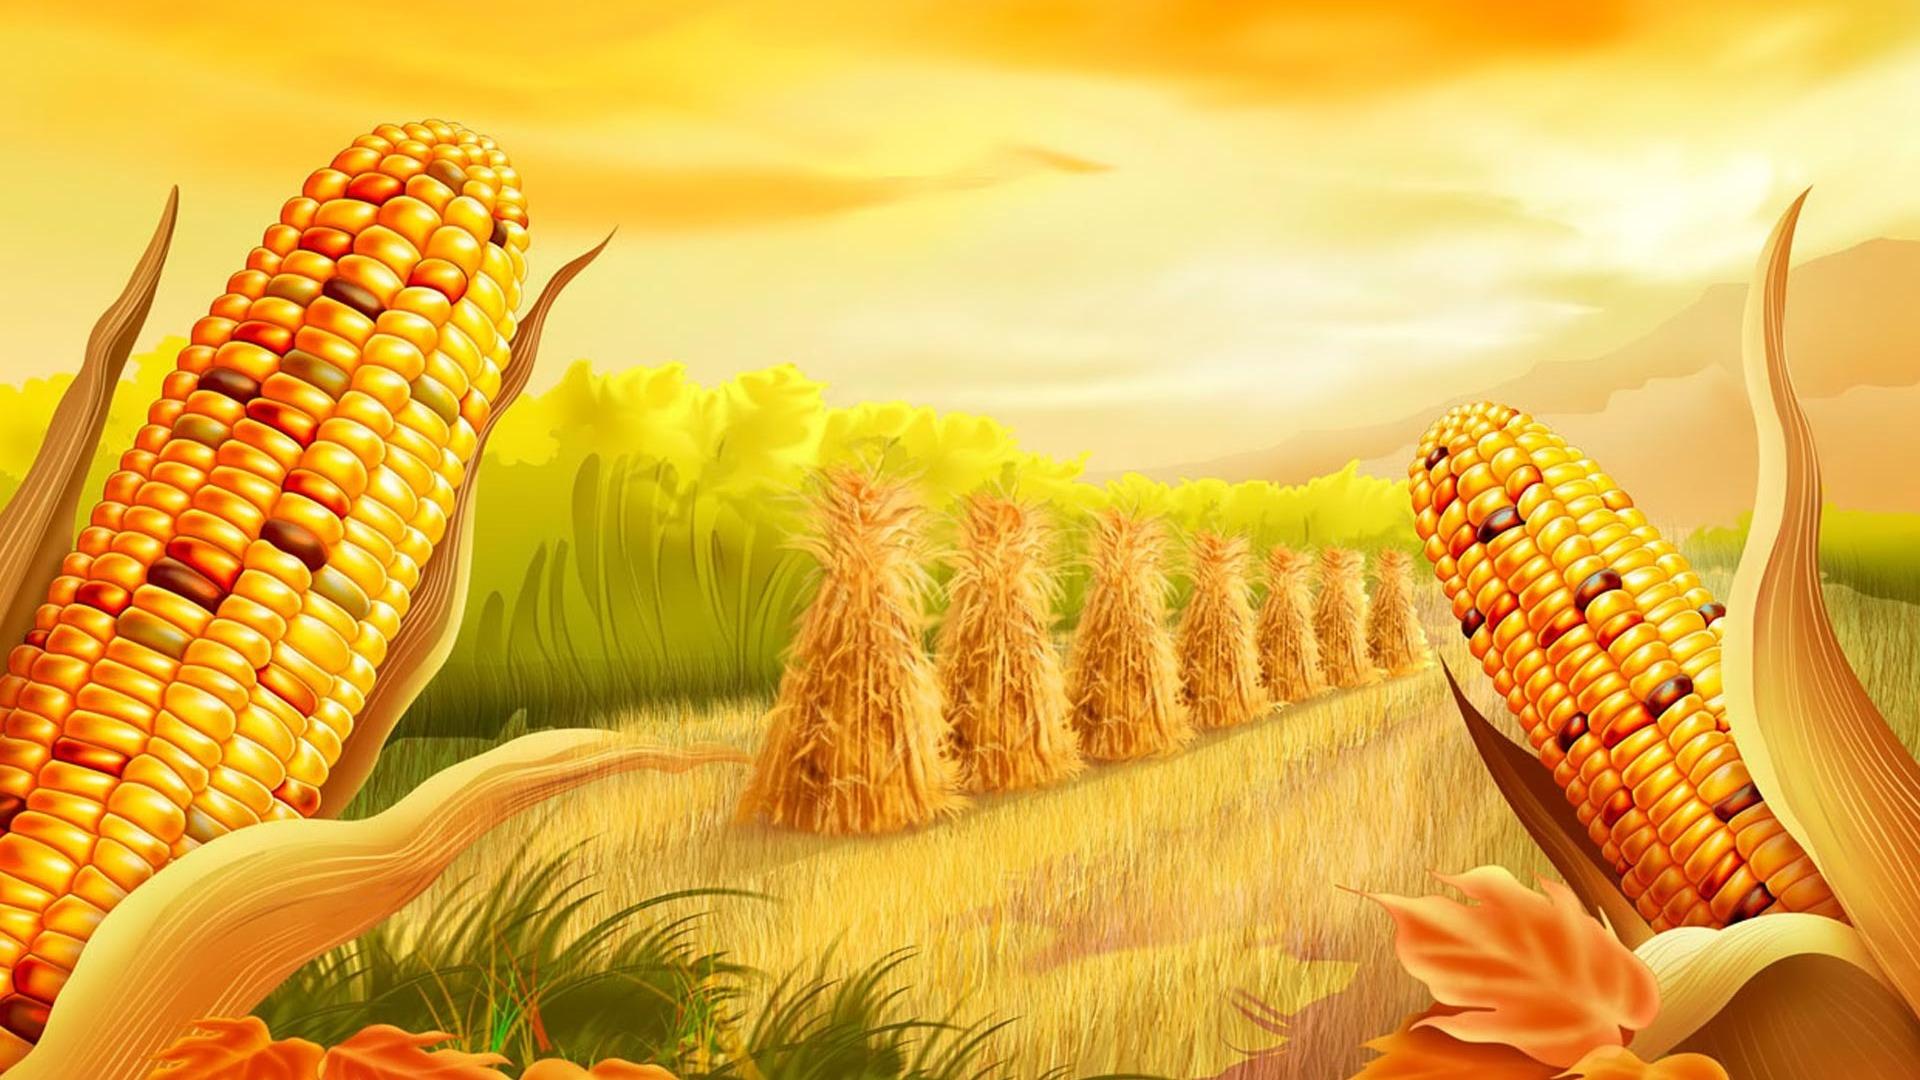 Cute Fall Background Wallpaper Corn Ready To Harvest Golden Hd Wallpaper